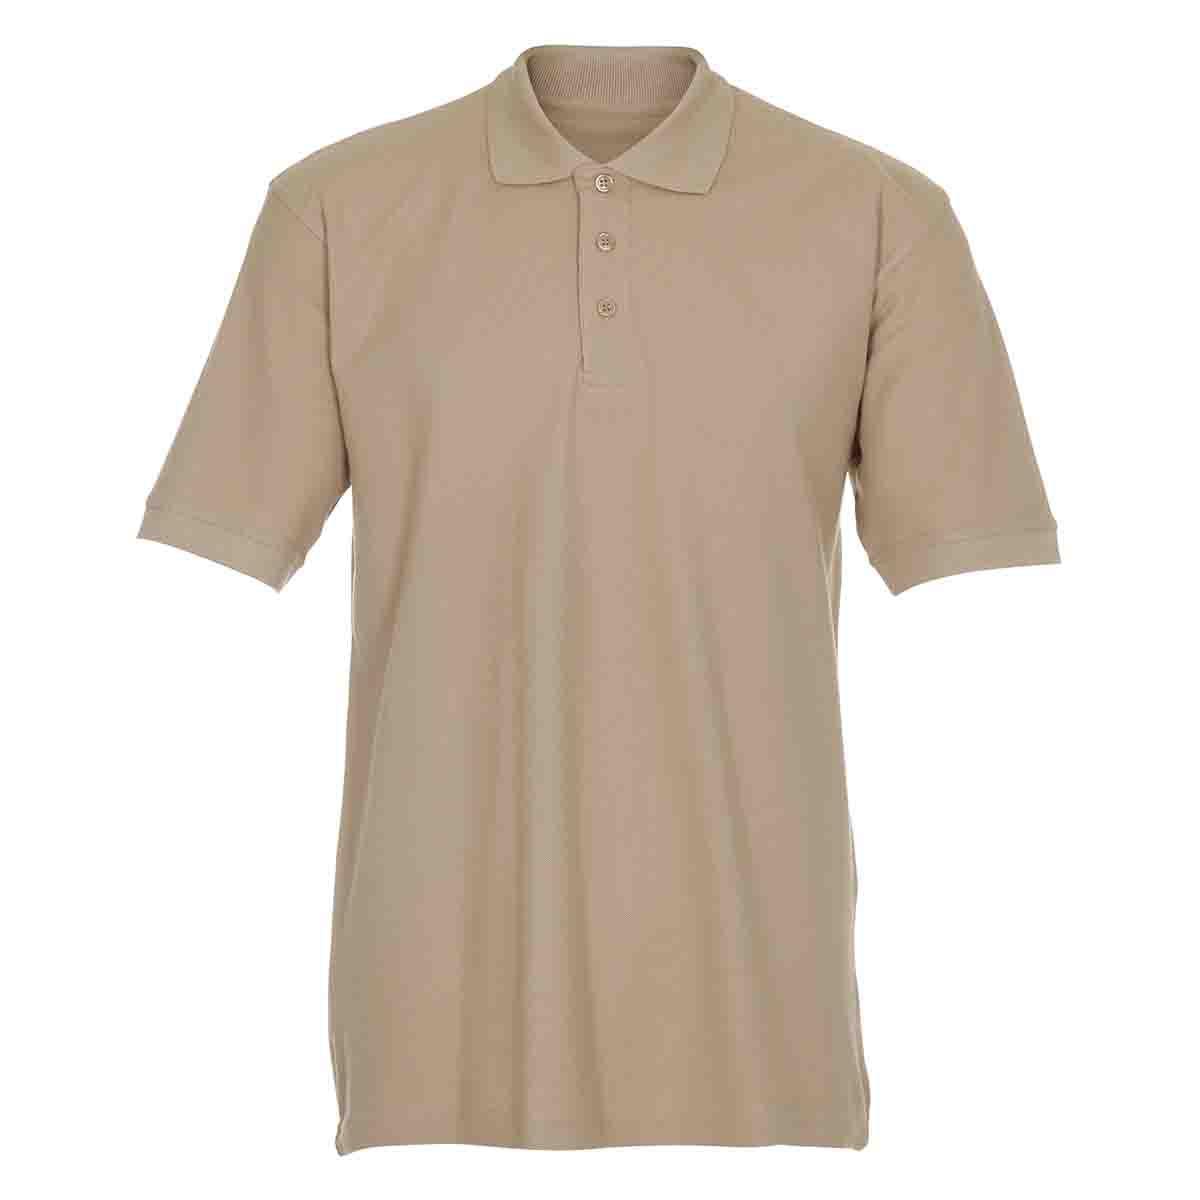 Poloshirt model 194